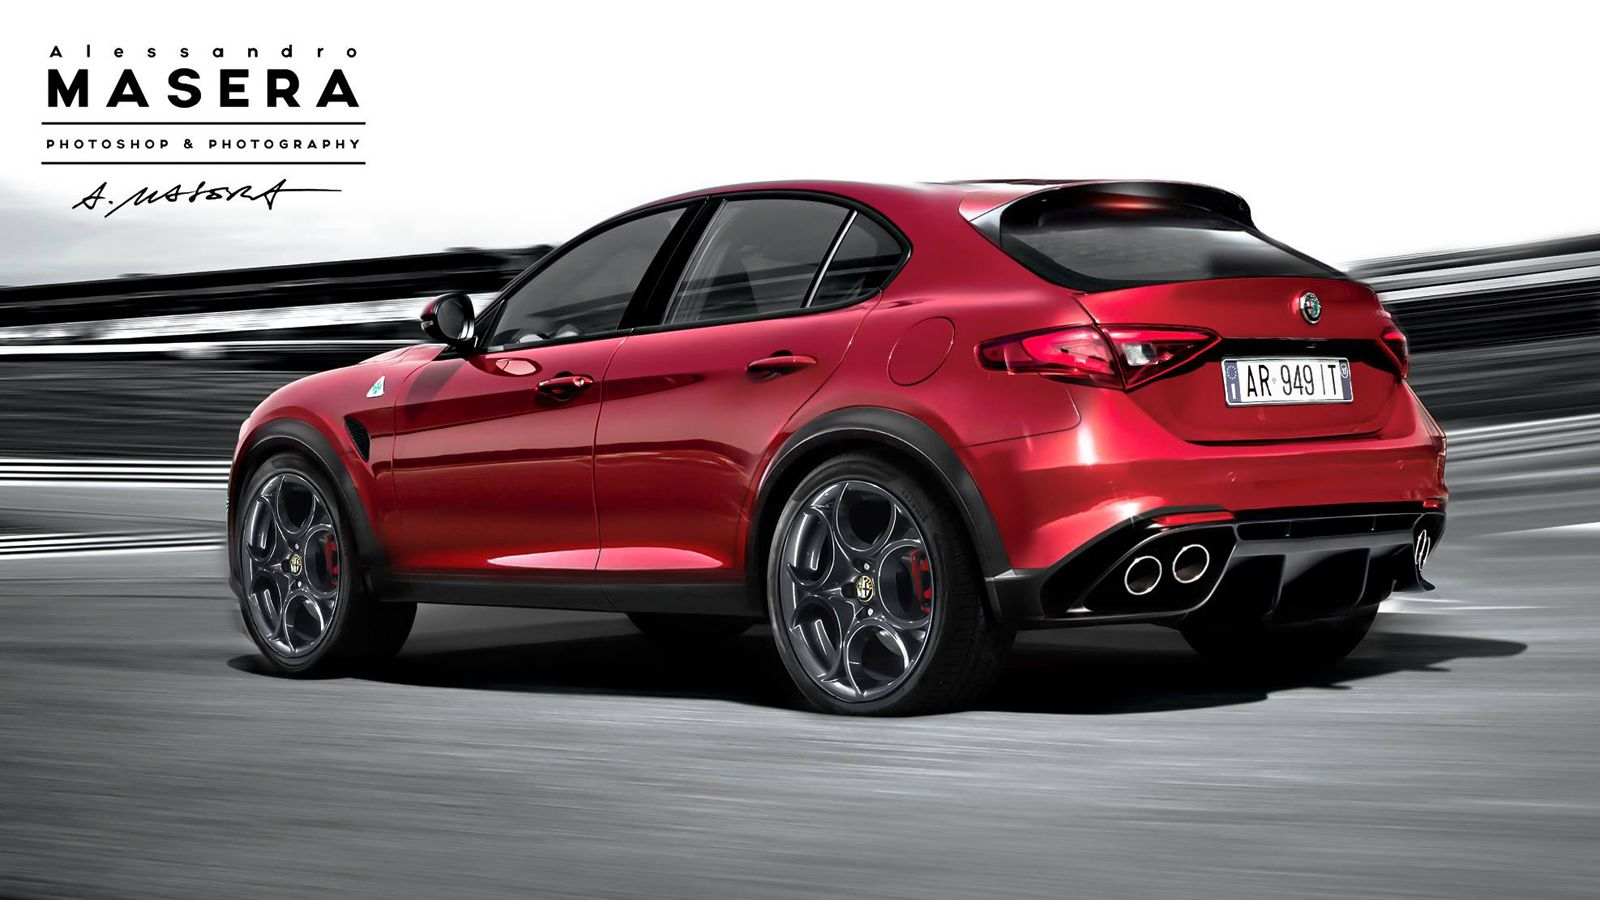 2018 Alfa Romeo Stelvio Reviews and Rating  Motor Trend